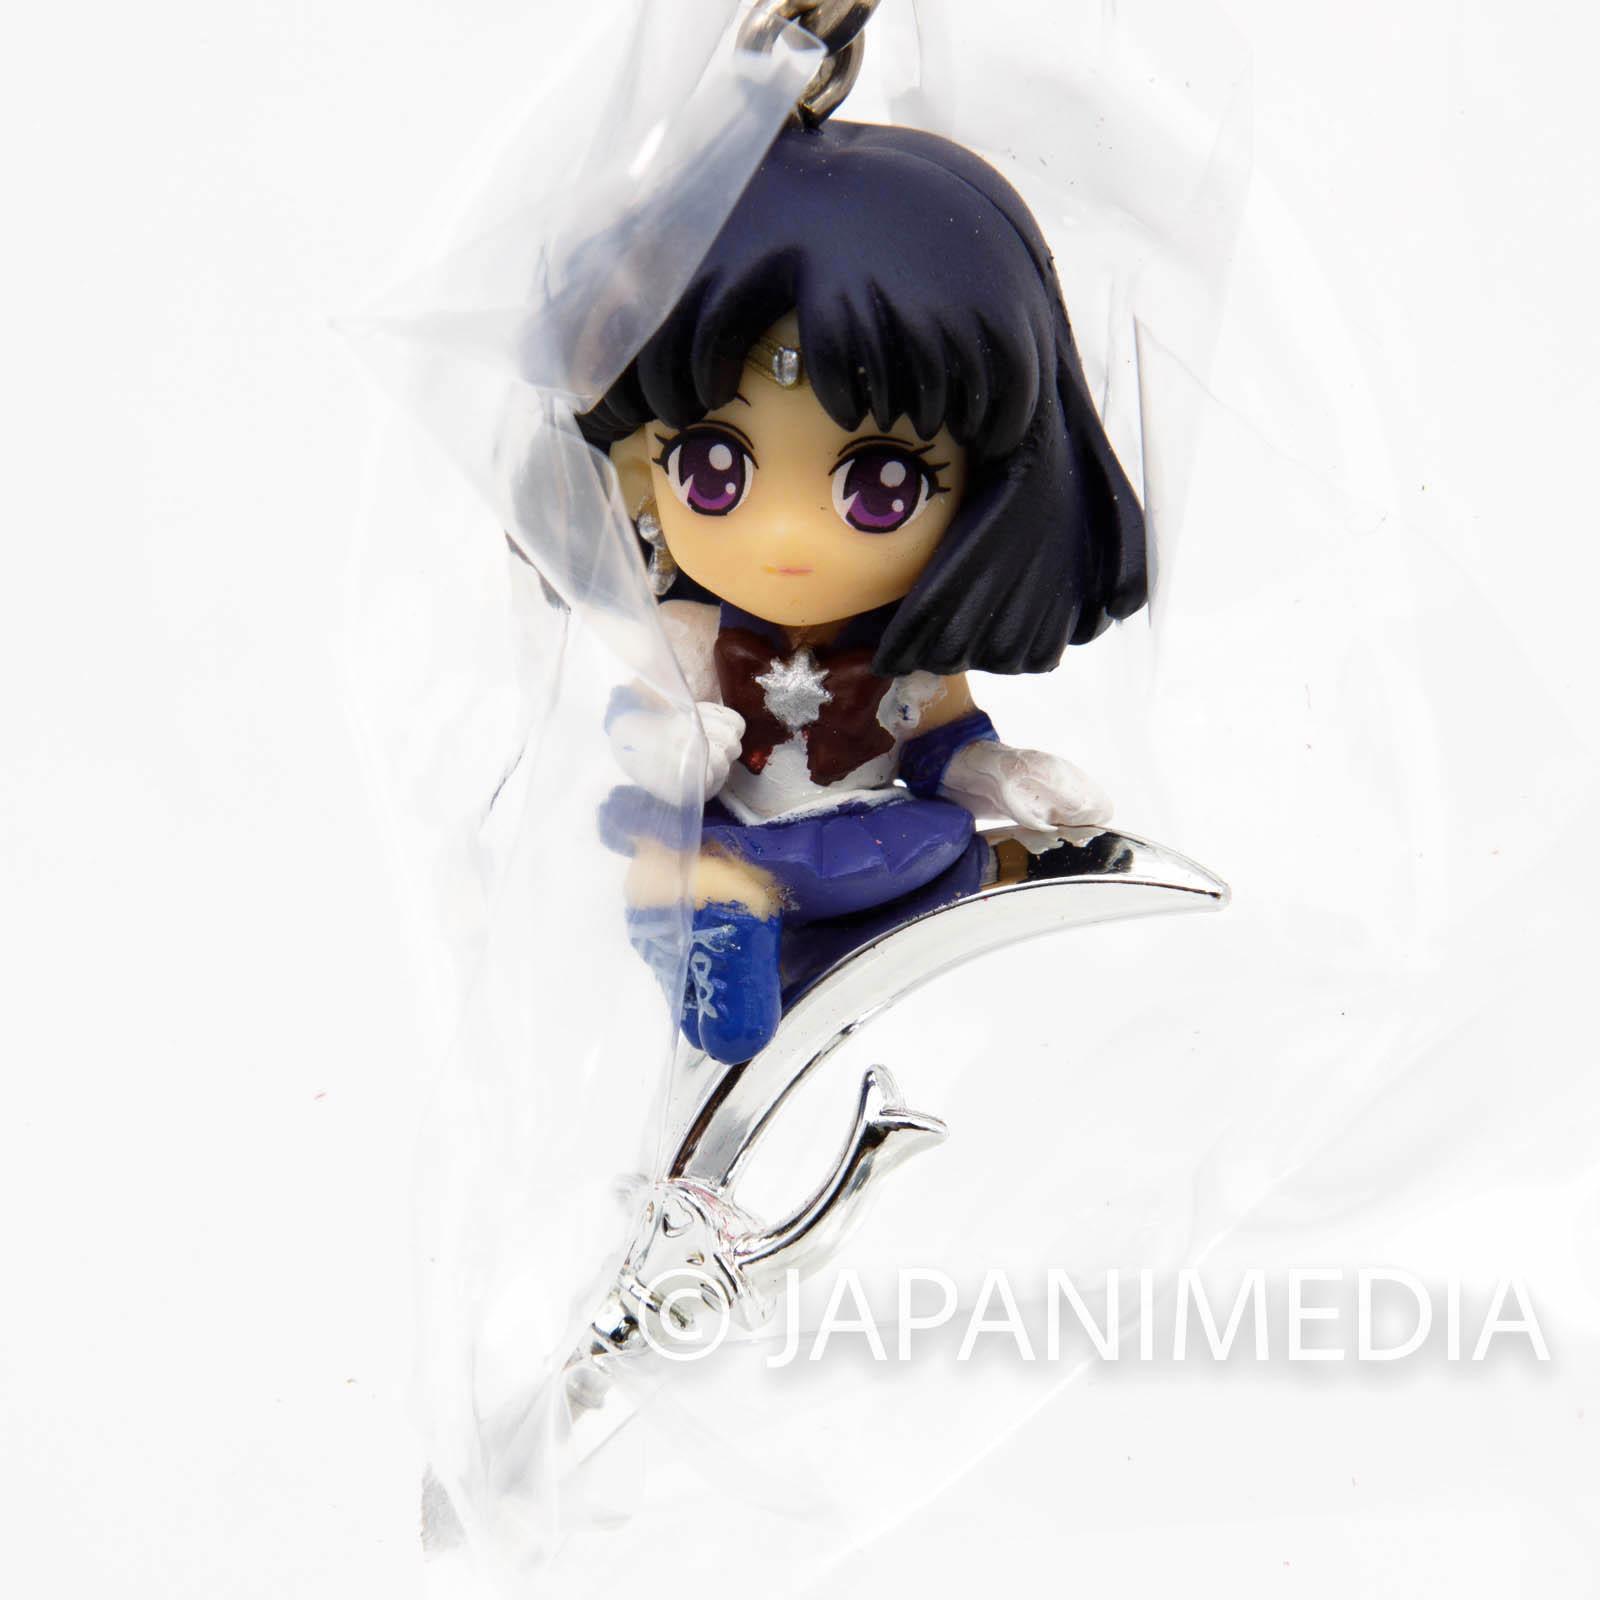 Sailor Moon Sailor Saturn Twinkle Dolly 2 Figure Strap JAPAN ANIME 2